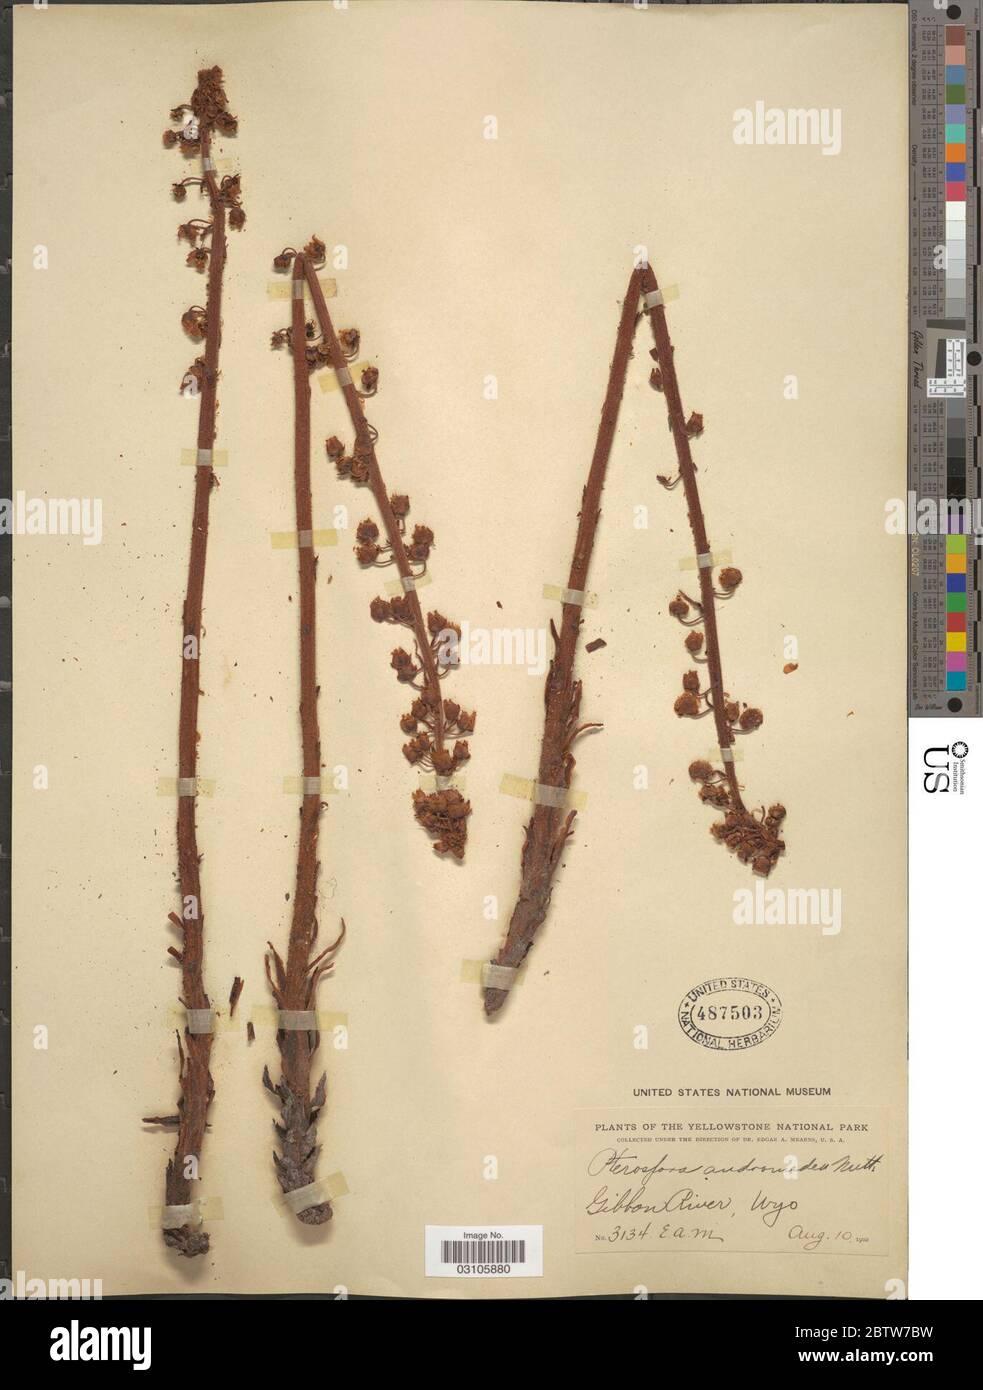 Pterospora andromedea Nutt. Stock Photo